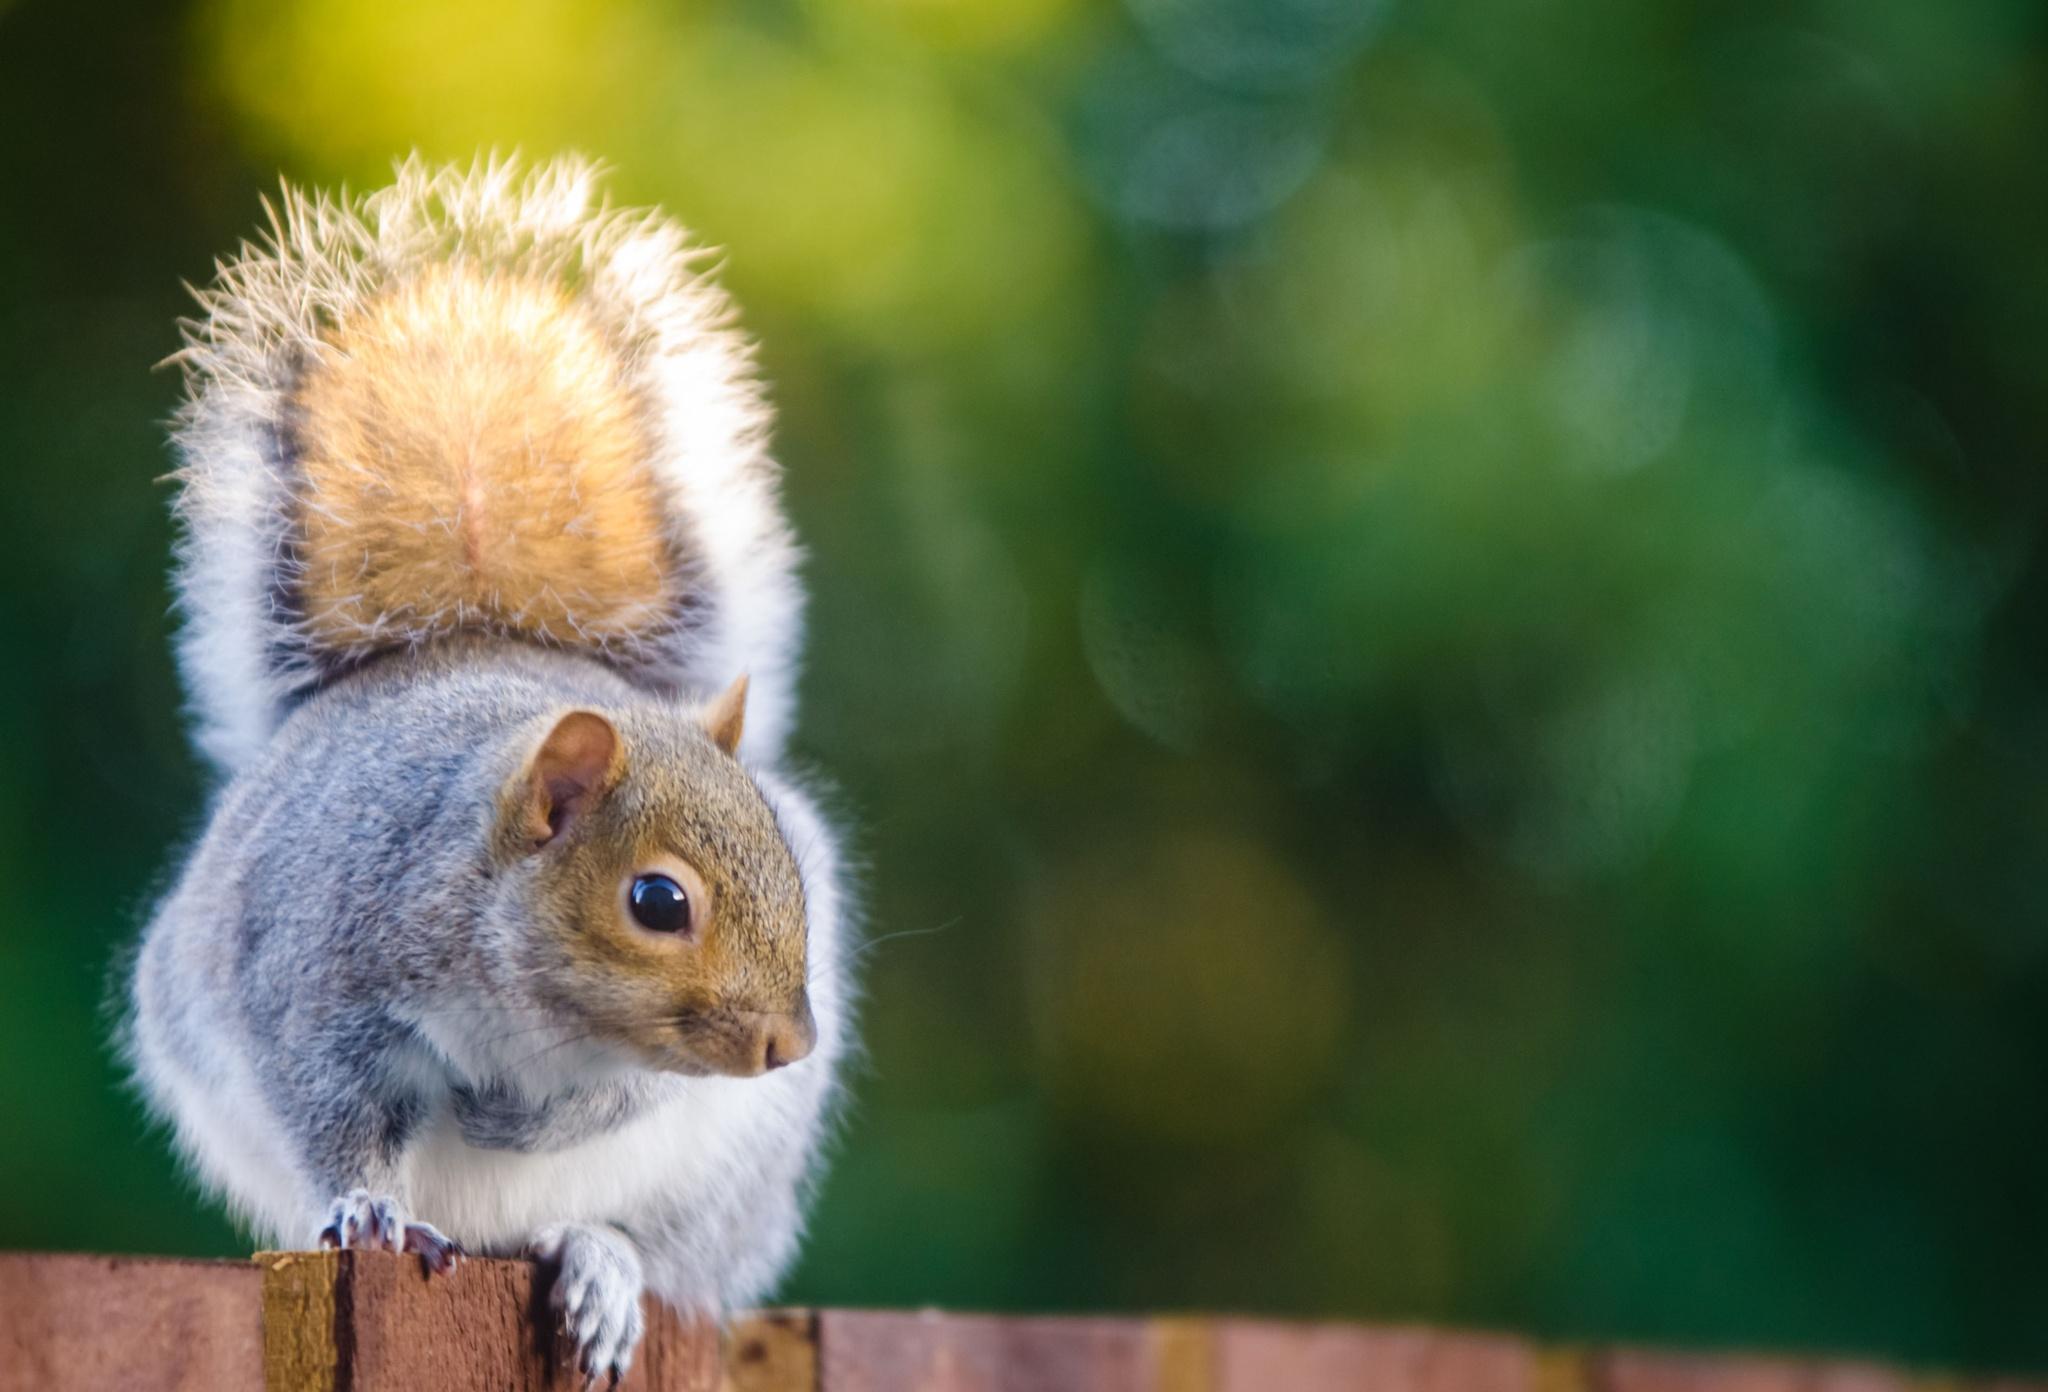 Squirrel Pose by Sandie_Burns